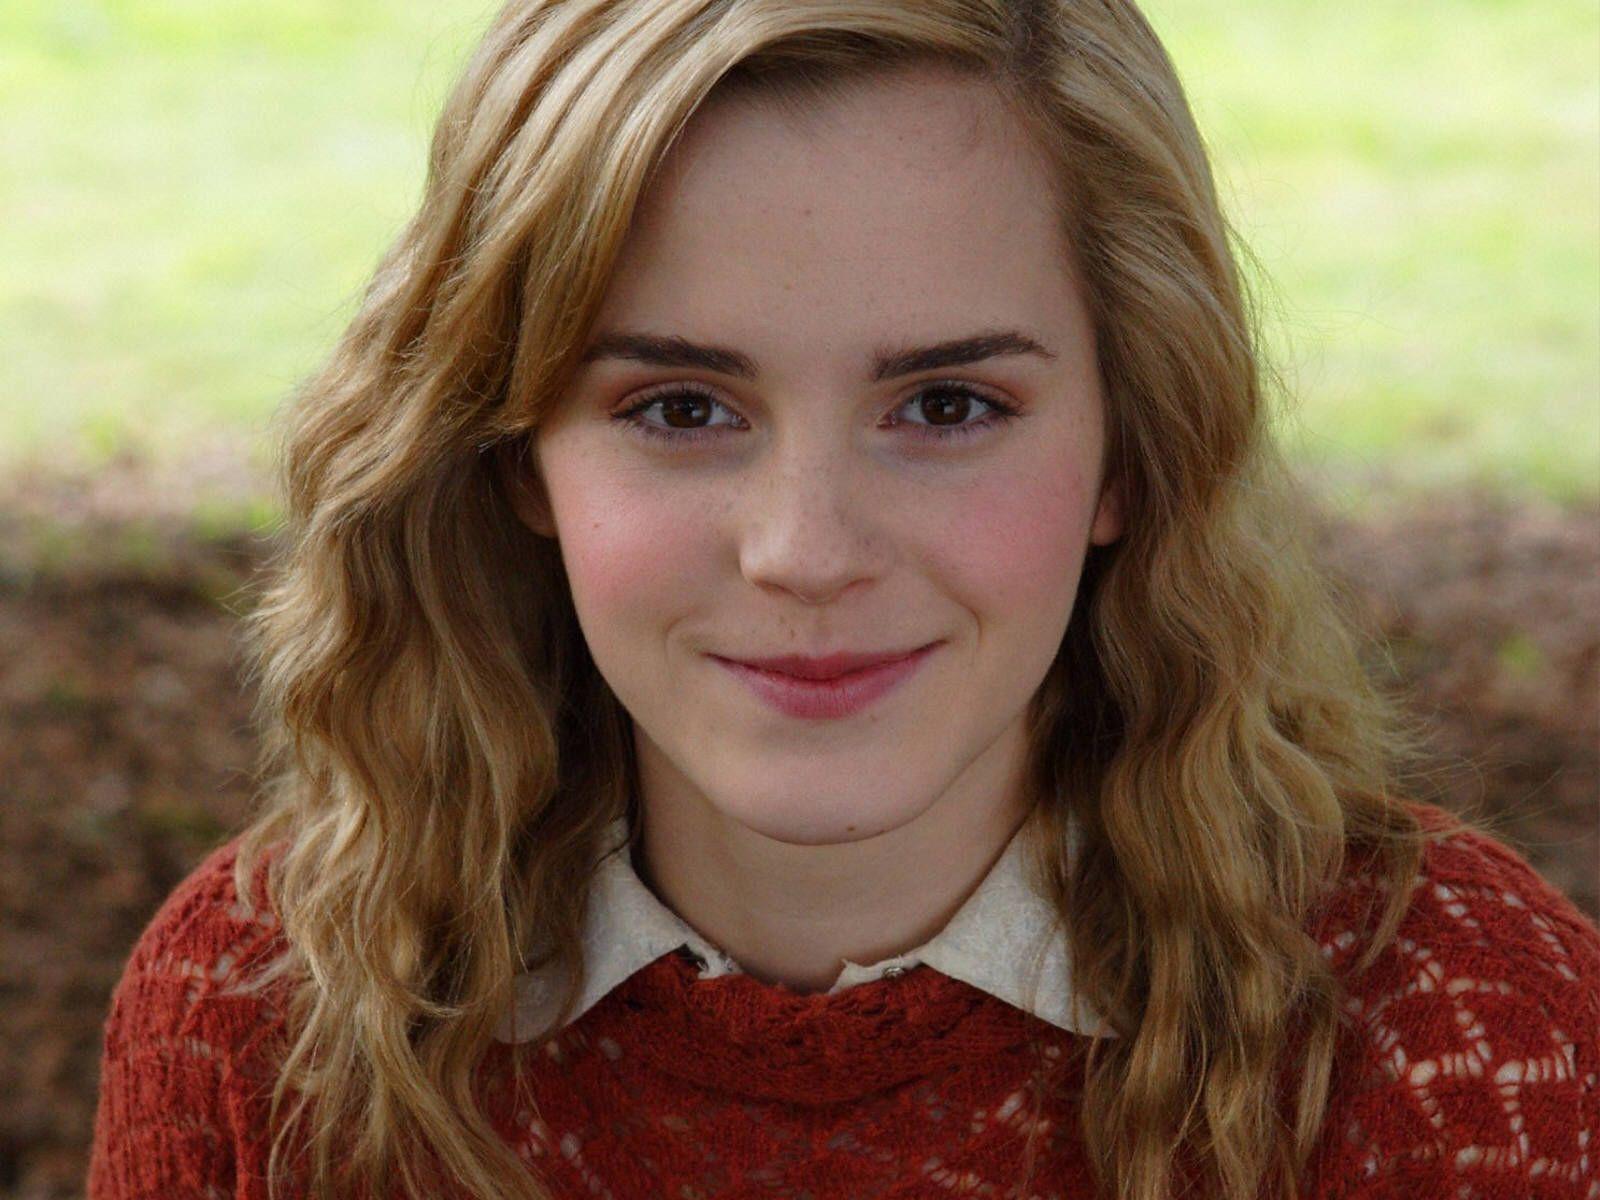 Emma Watson Wallpapers Gallery ~ Sheryali | News, Tips ...